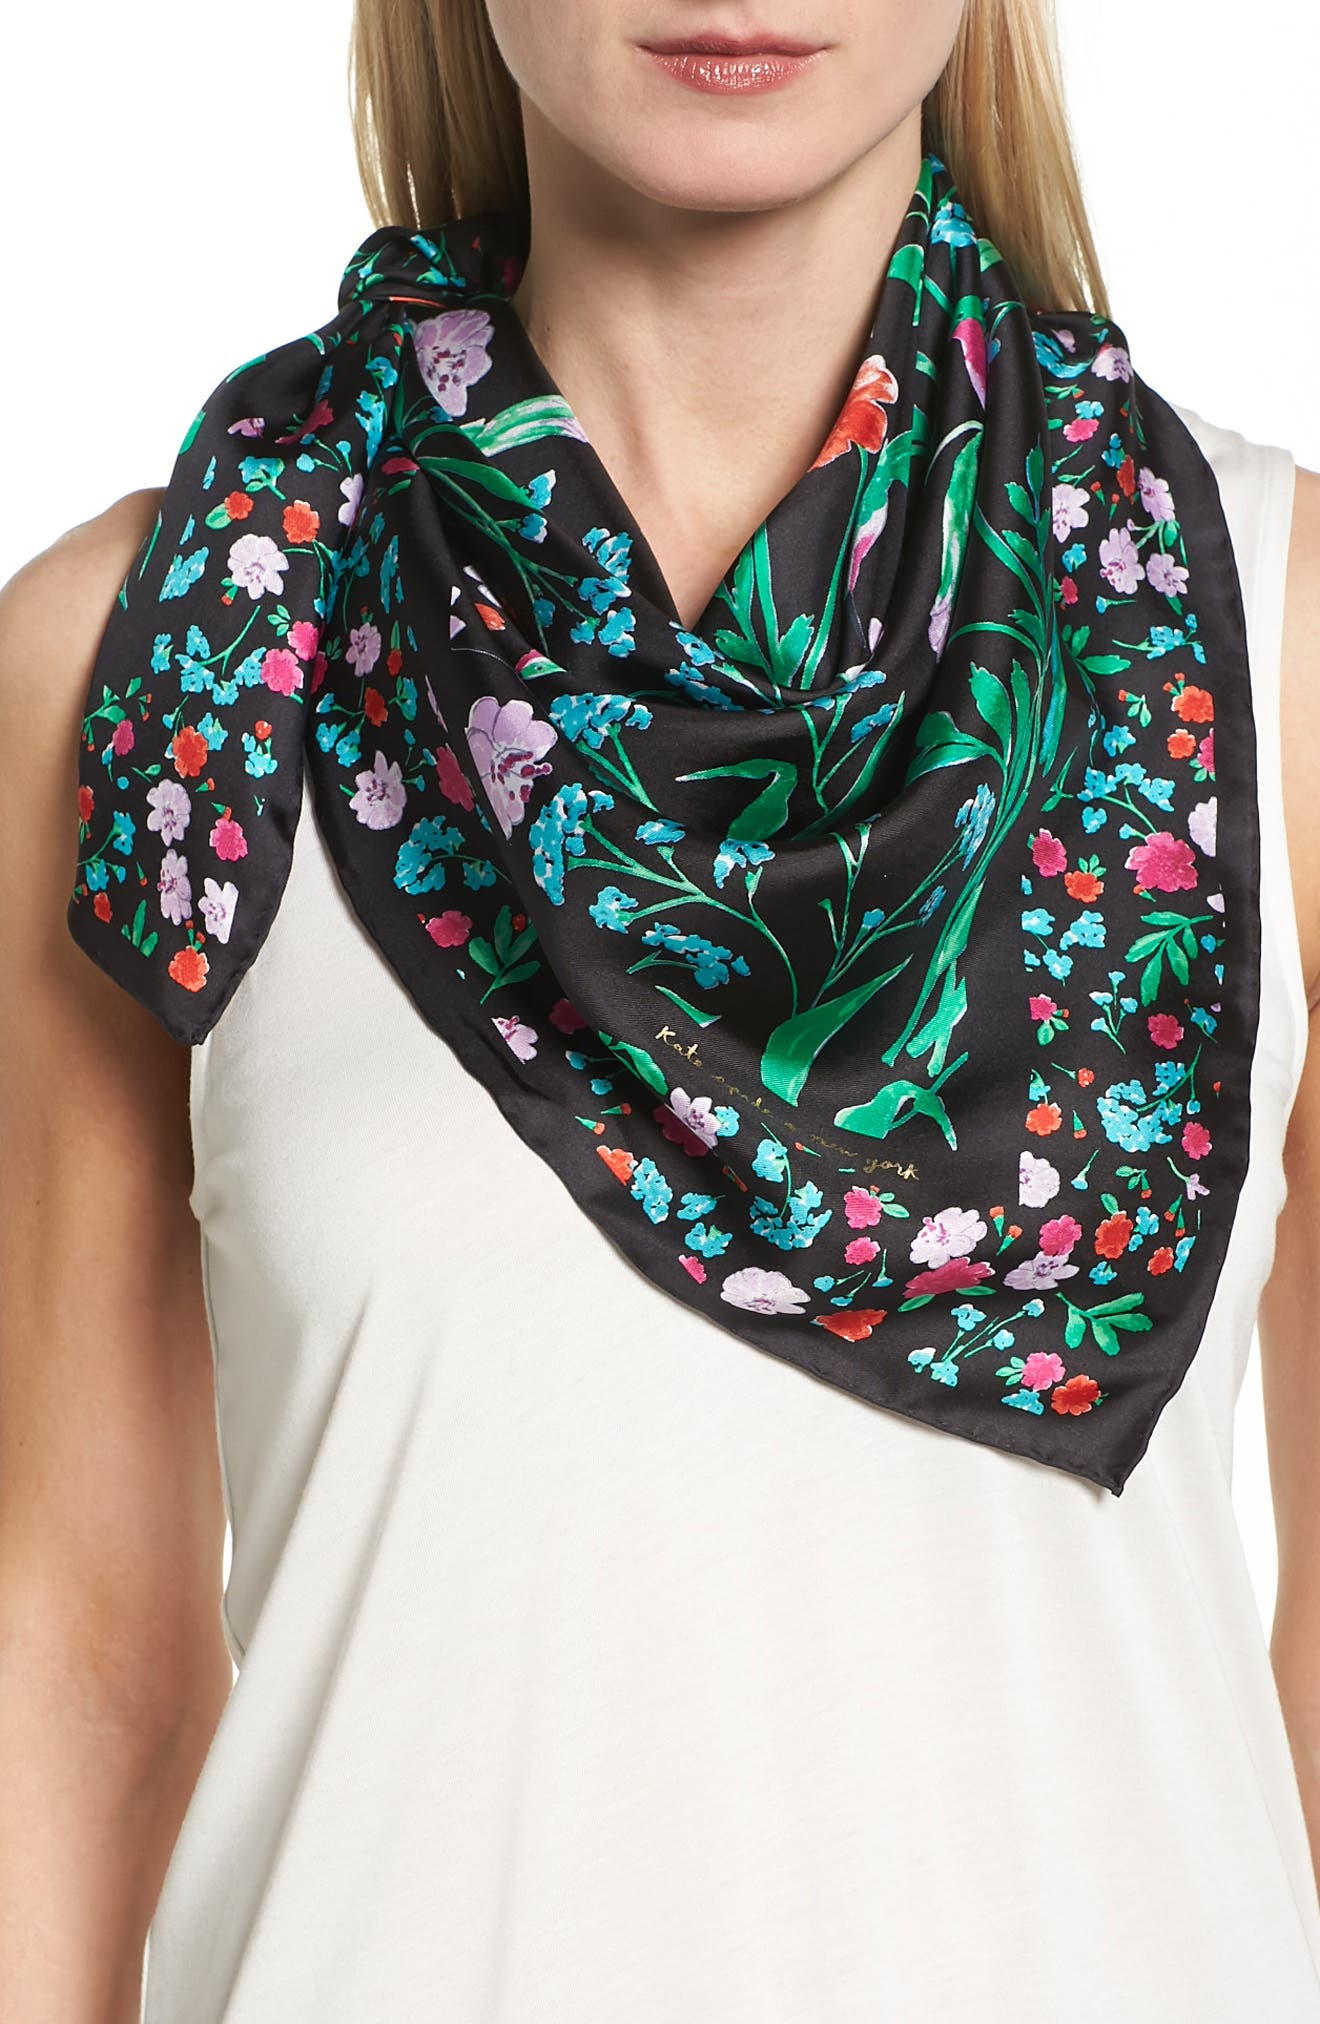 KATE SPADE NEW YORK,                             jardin silk square scarf,                             Main thumbnail 1, color,                             001